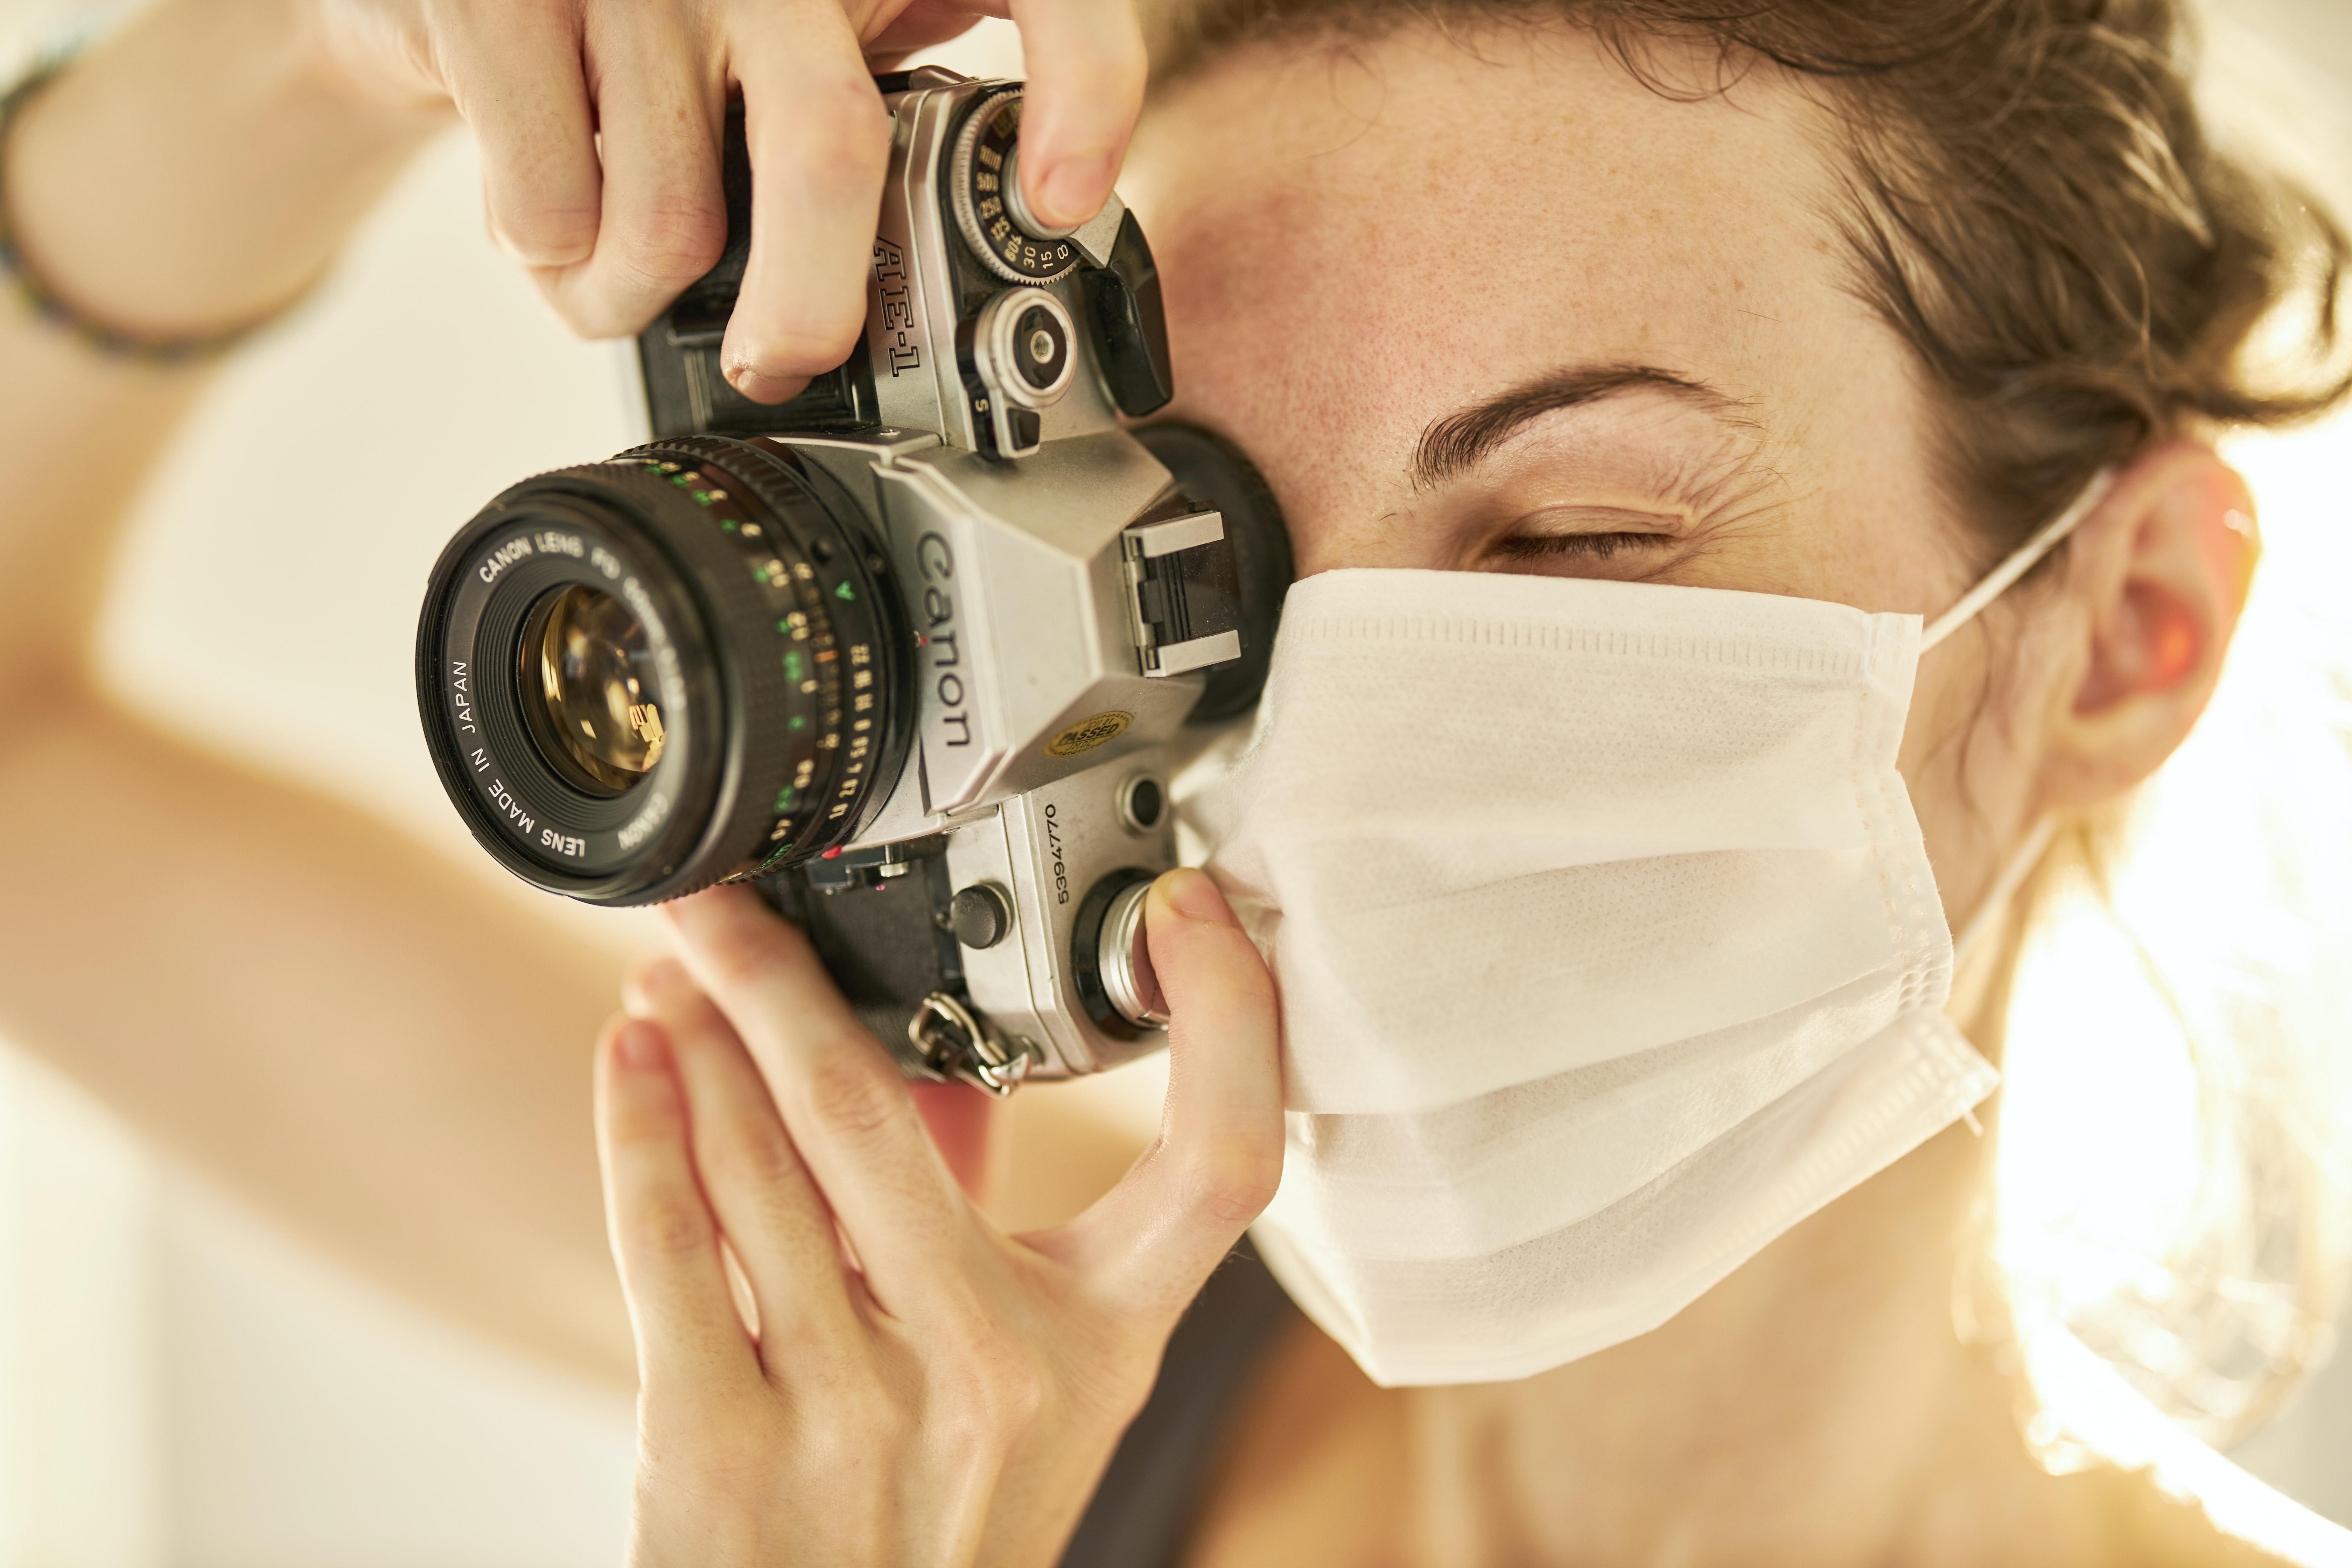 Your End-of-Summer Quarantine Bucket List for Better Mental Health